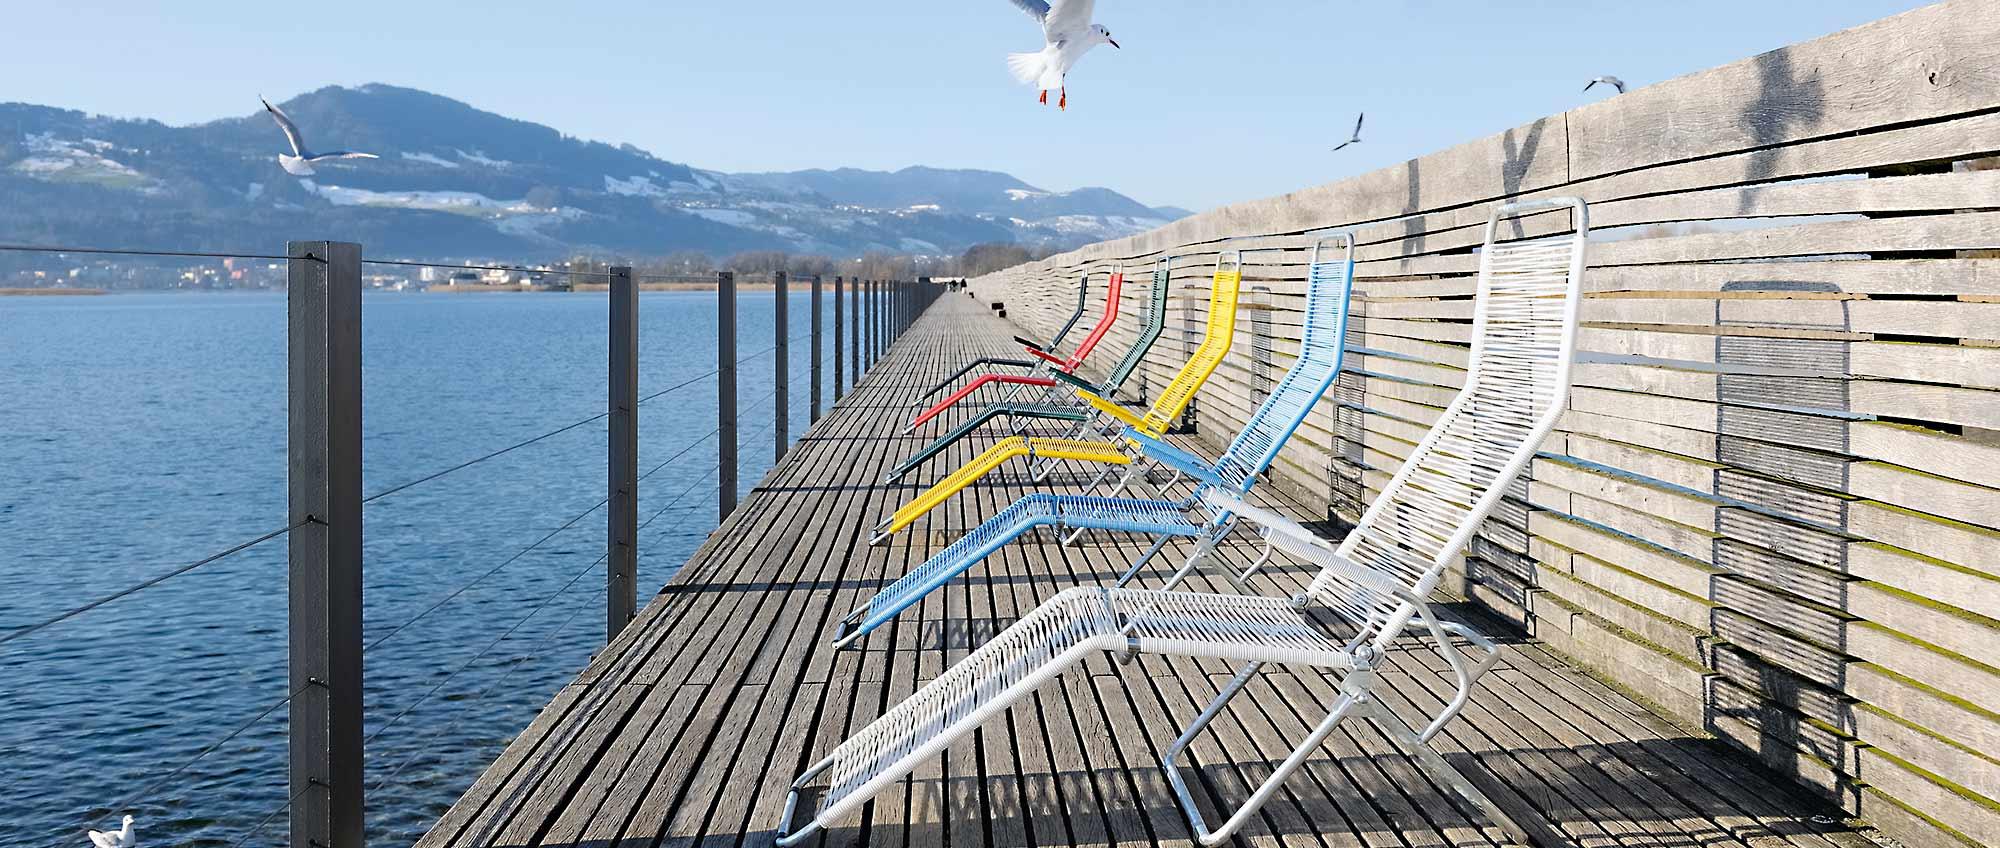 Spaghetti Stuhl u2013 Altorfer Lounge Set + Altorfer Liegestuhl Bestswiss ~ 02231707_Altorfer Liegestuhl Neu Bespannen